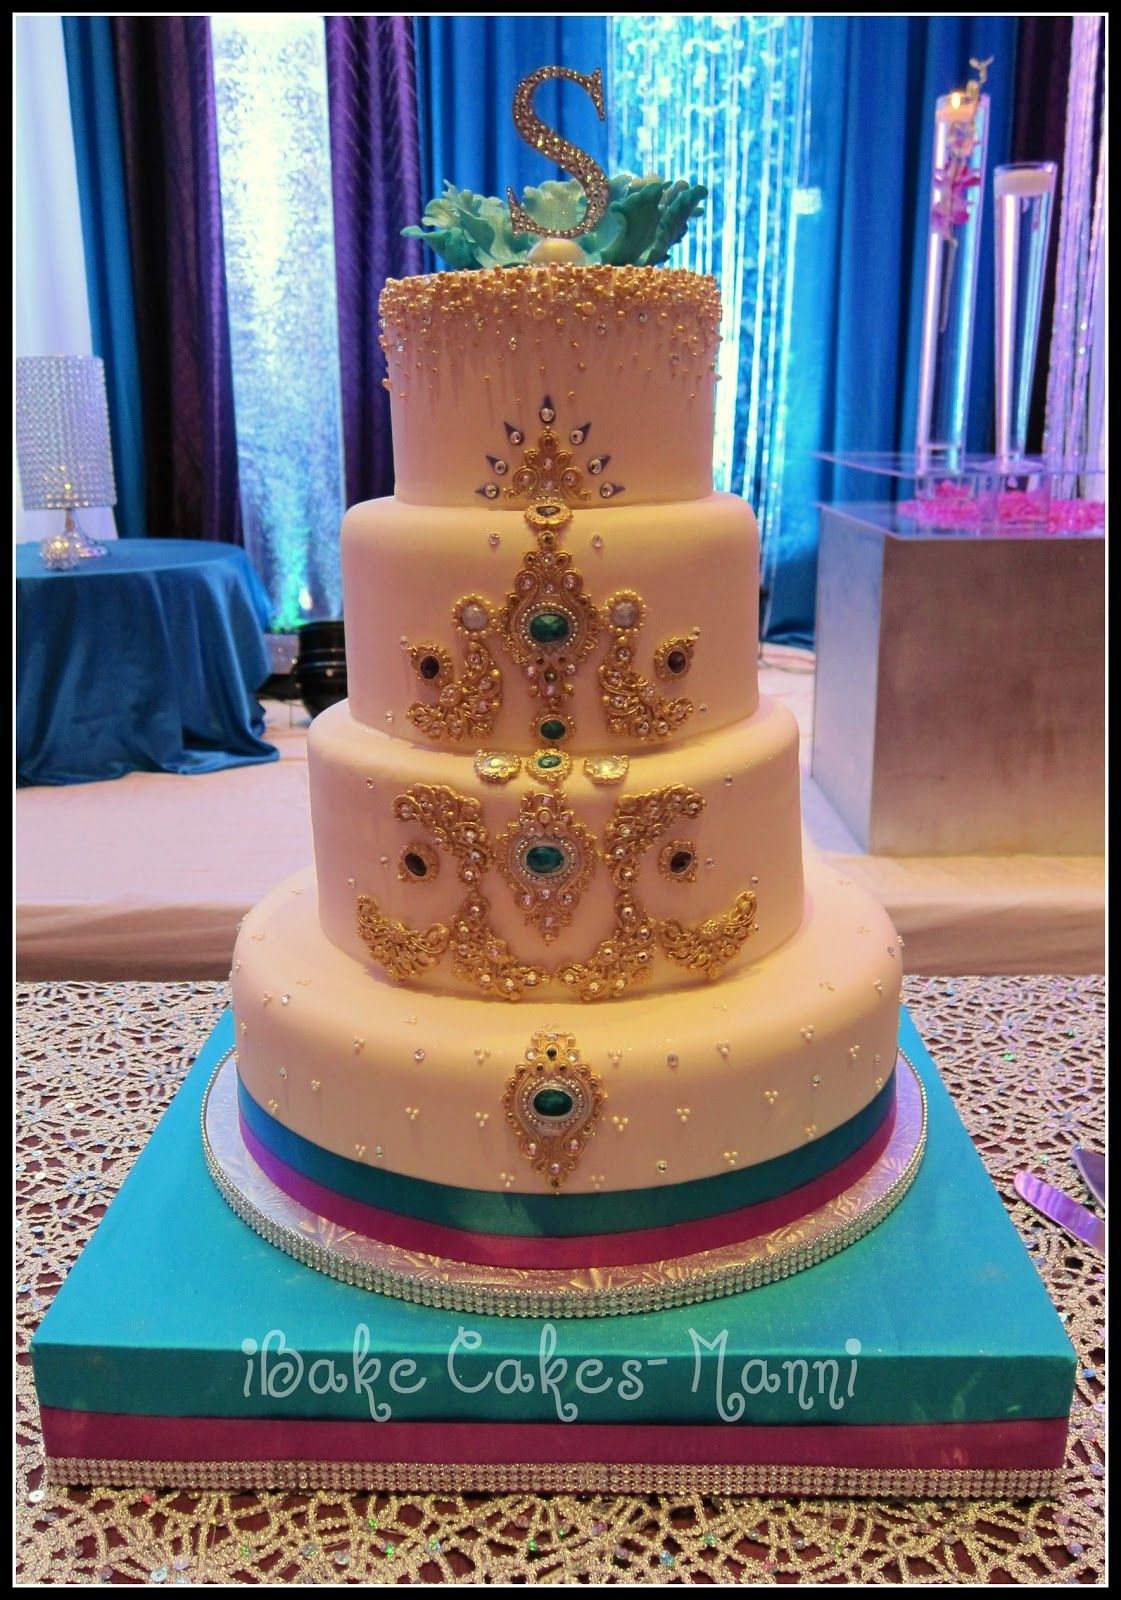 Amazing Intricate Wedding Cakes on Pinterest